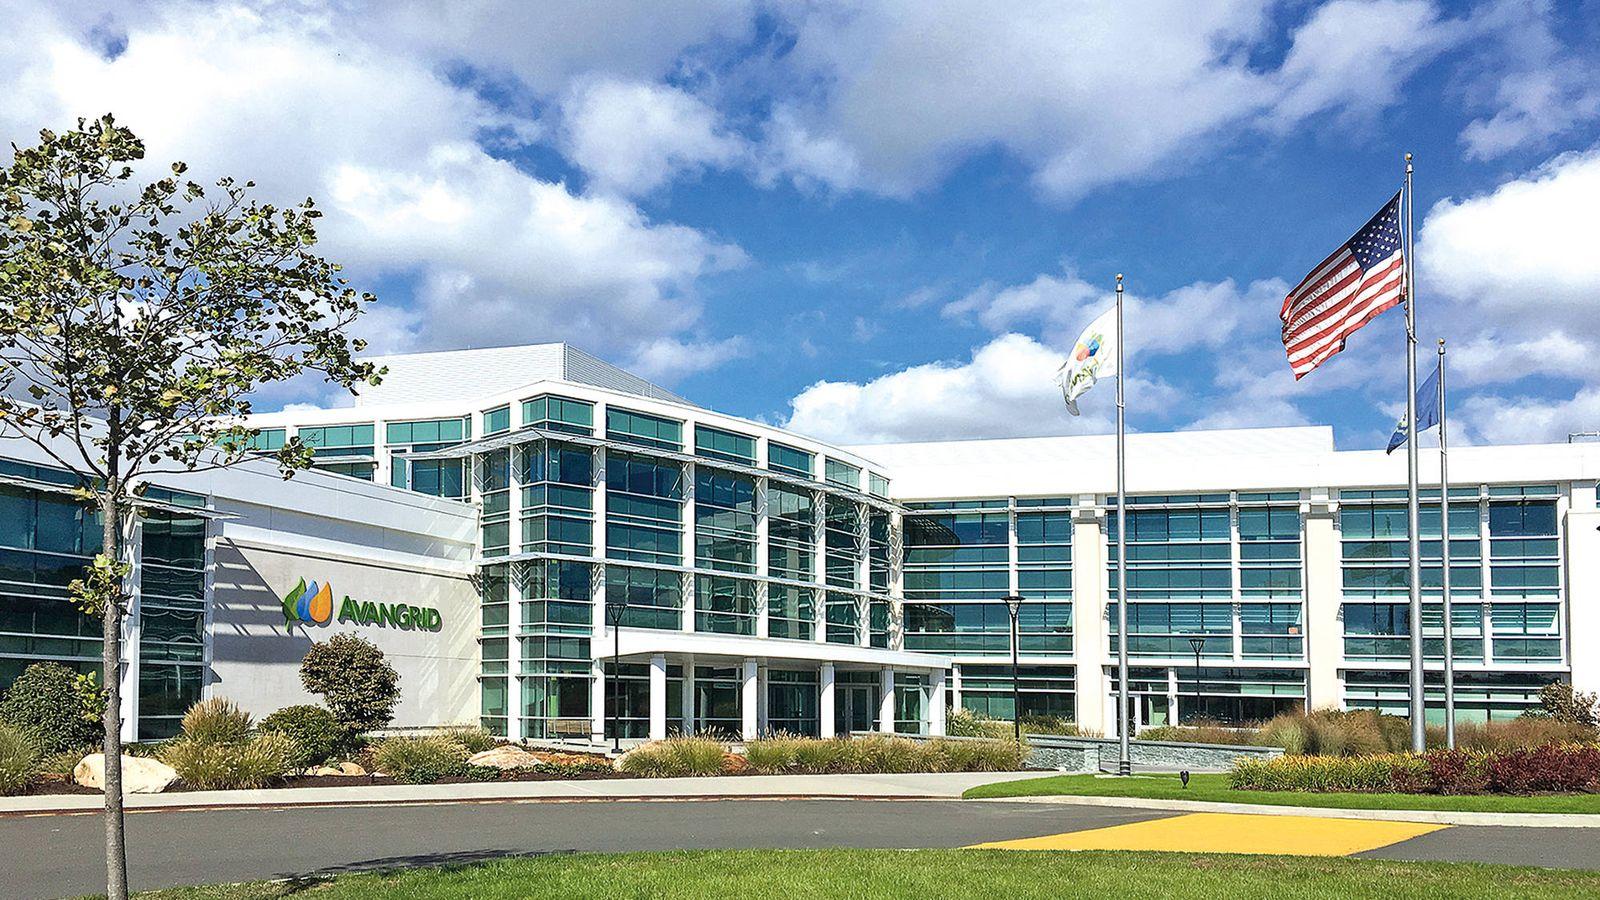 Foto: Sede de Avangrid, filial de Iberdrola, en EEUU